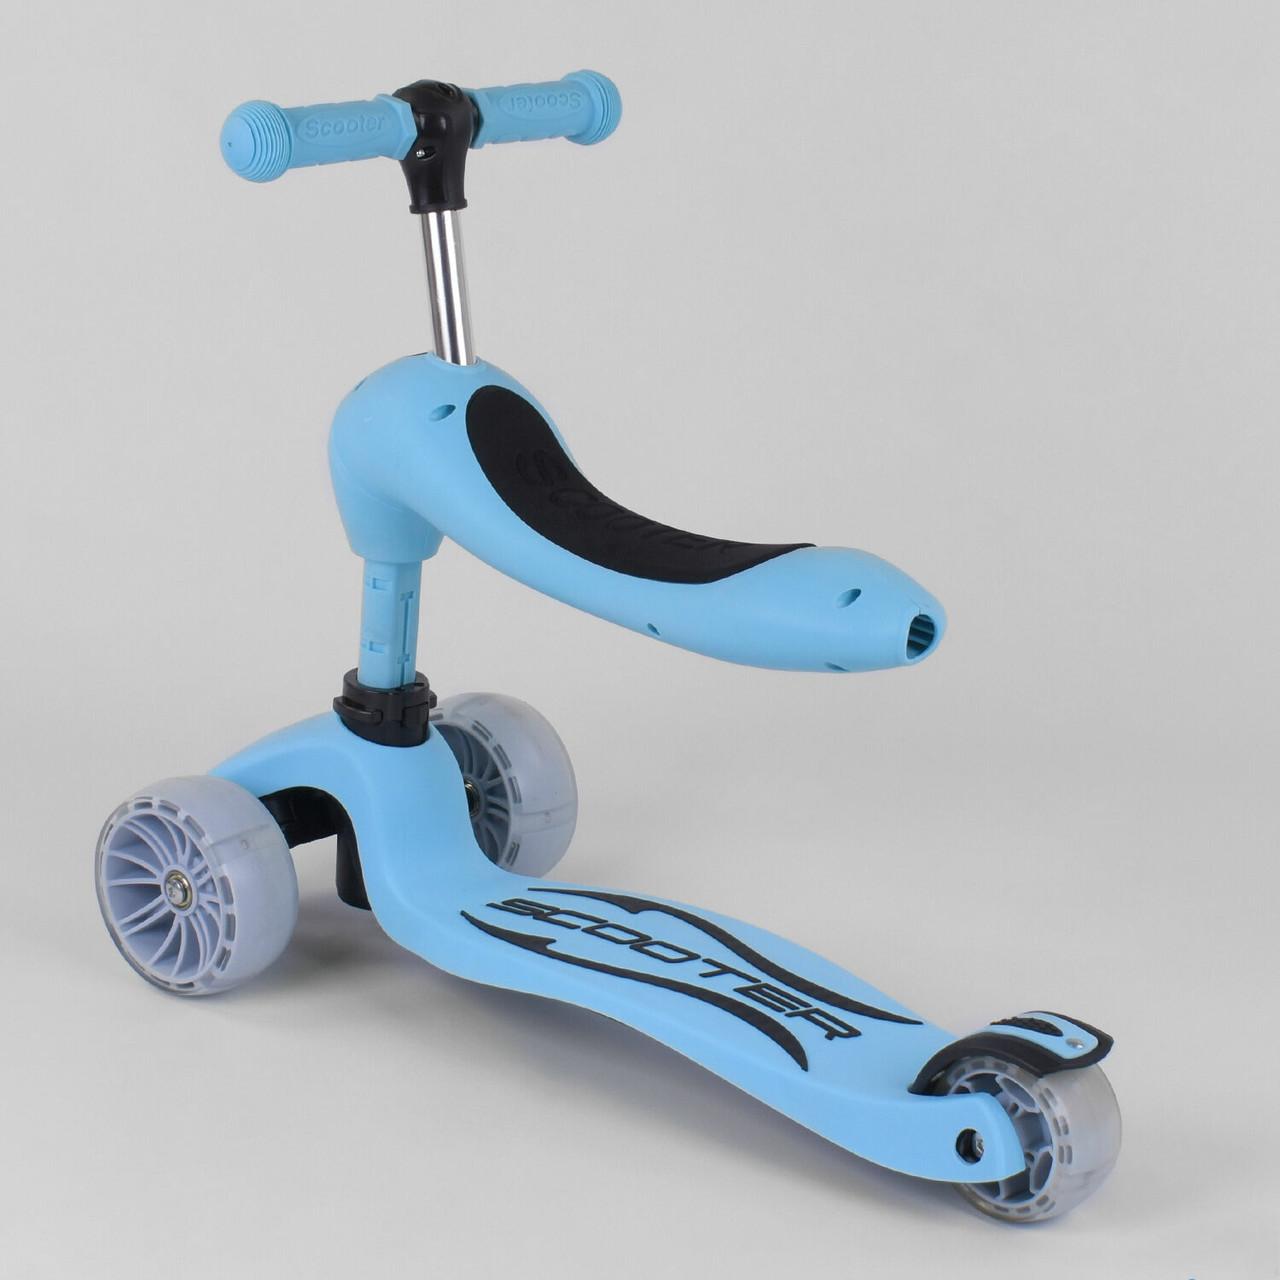 "Самокат S - 9001 ""Best Scooter"" (6) Блакитний, PU колеса зі світлом 120х40 см"